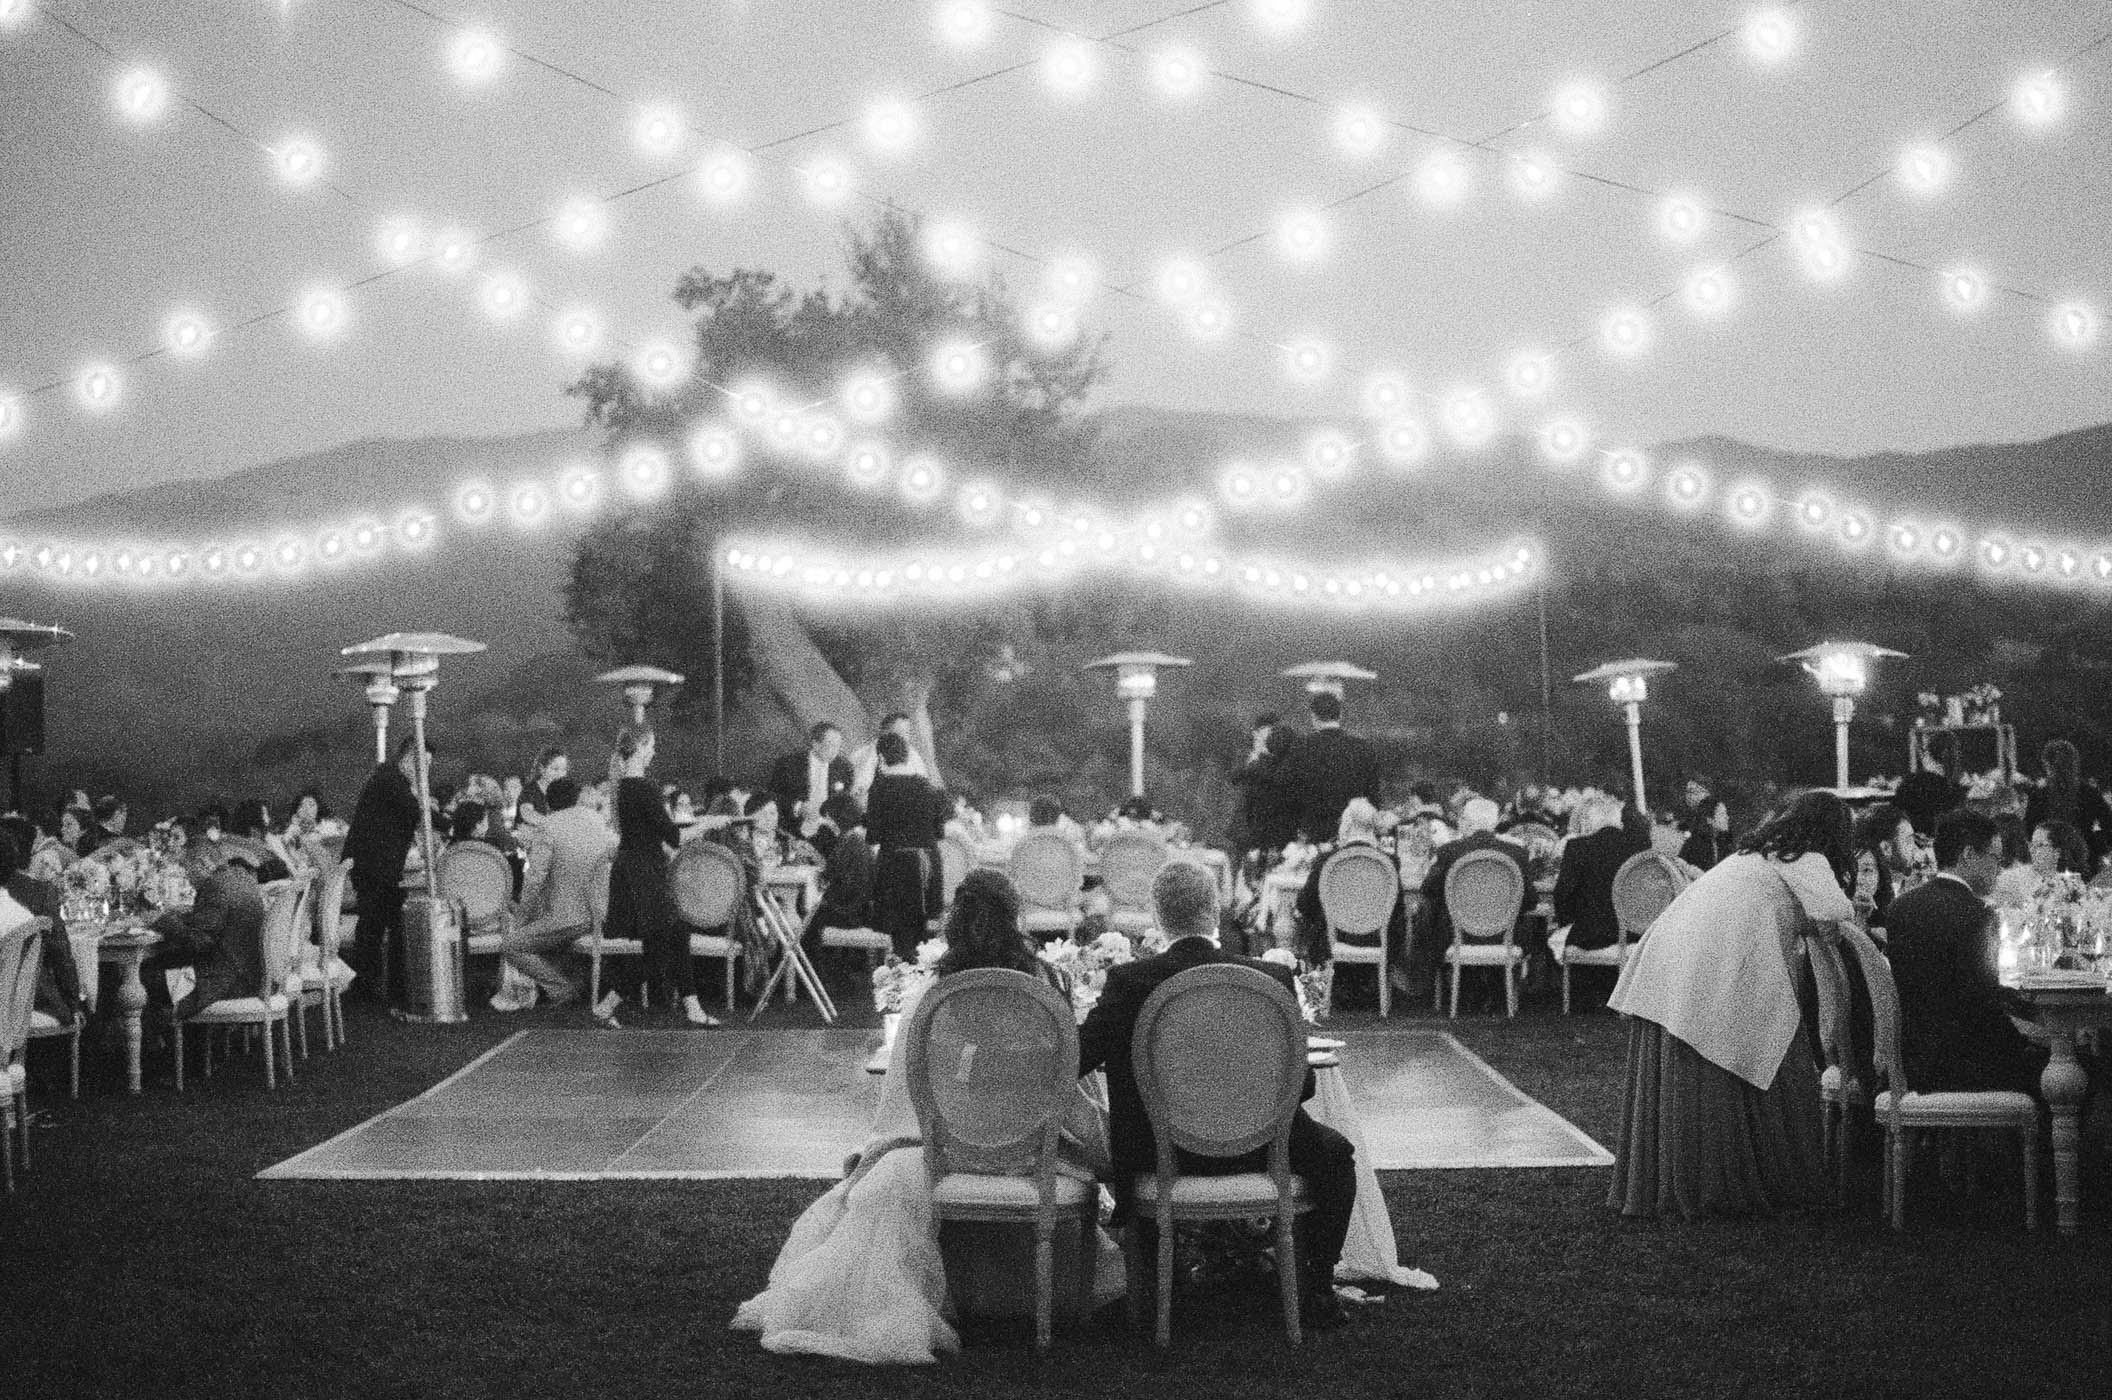 sunstone-villa-wedding-42-Jen_Huang-RD-207-Jen_Huang-000010420027.jpg